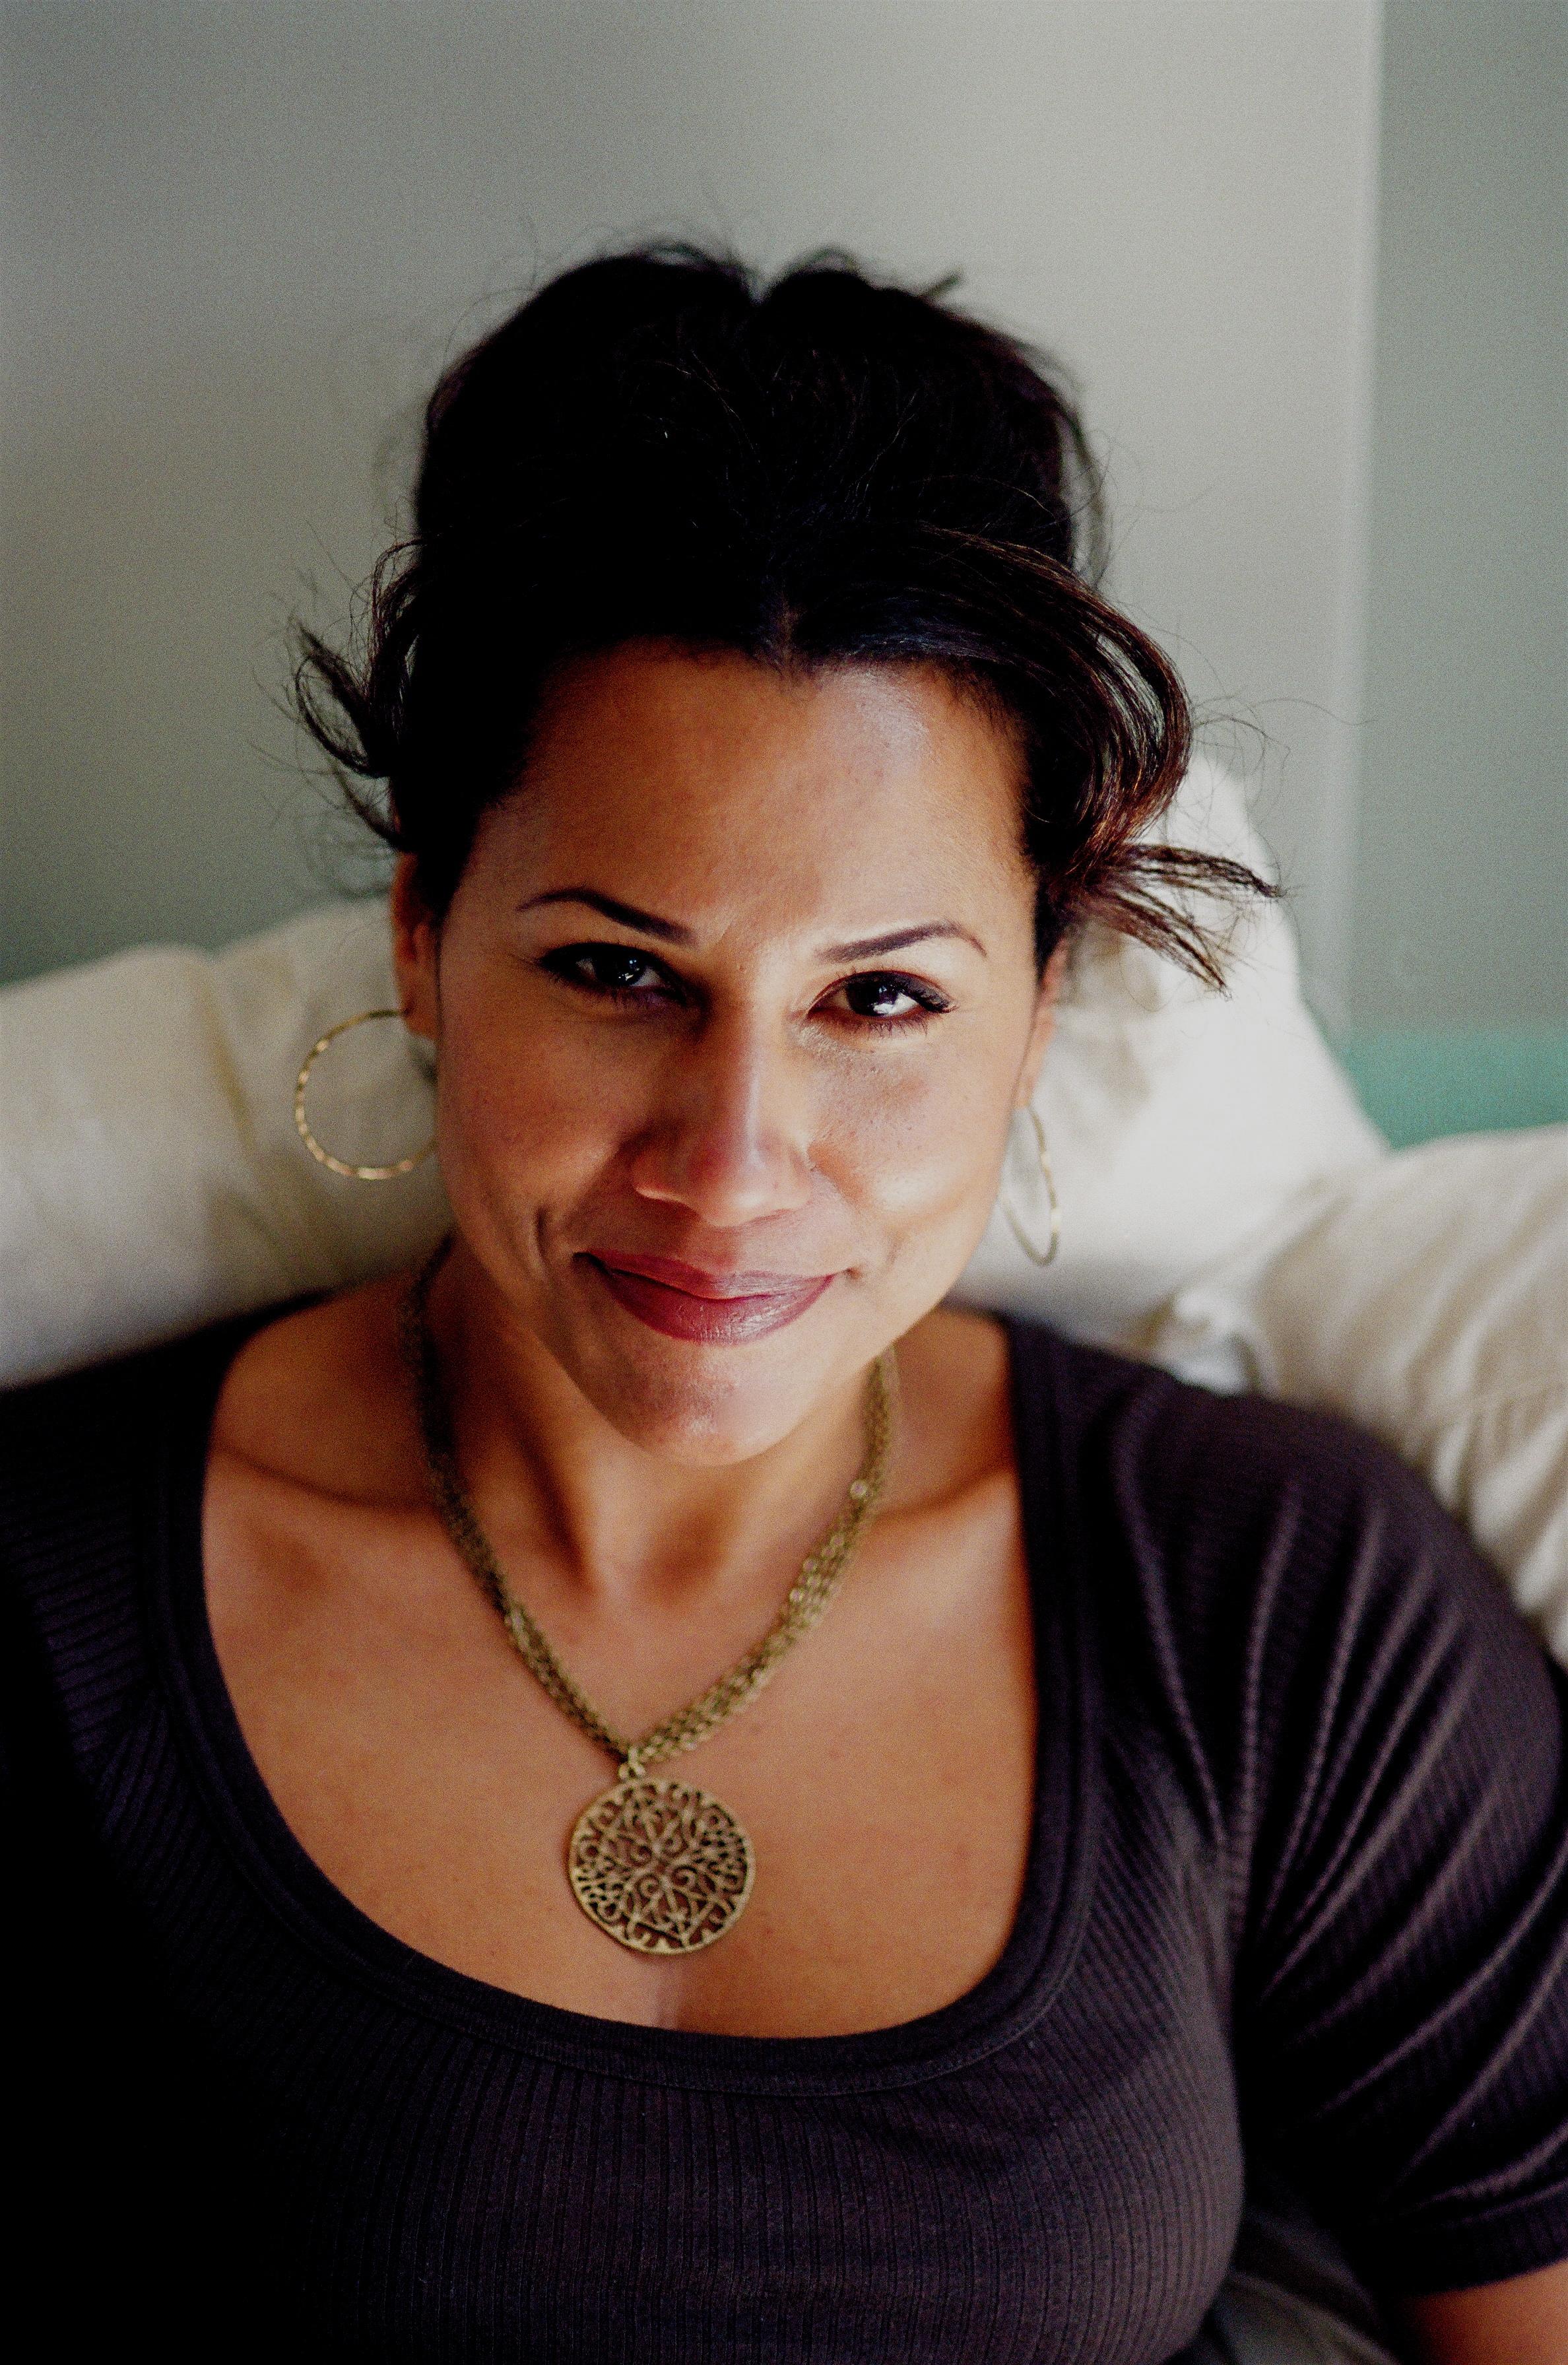 Dr. Kristina Ivy of RICA bath + body